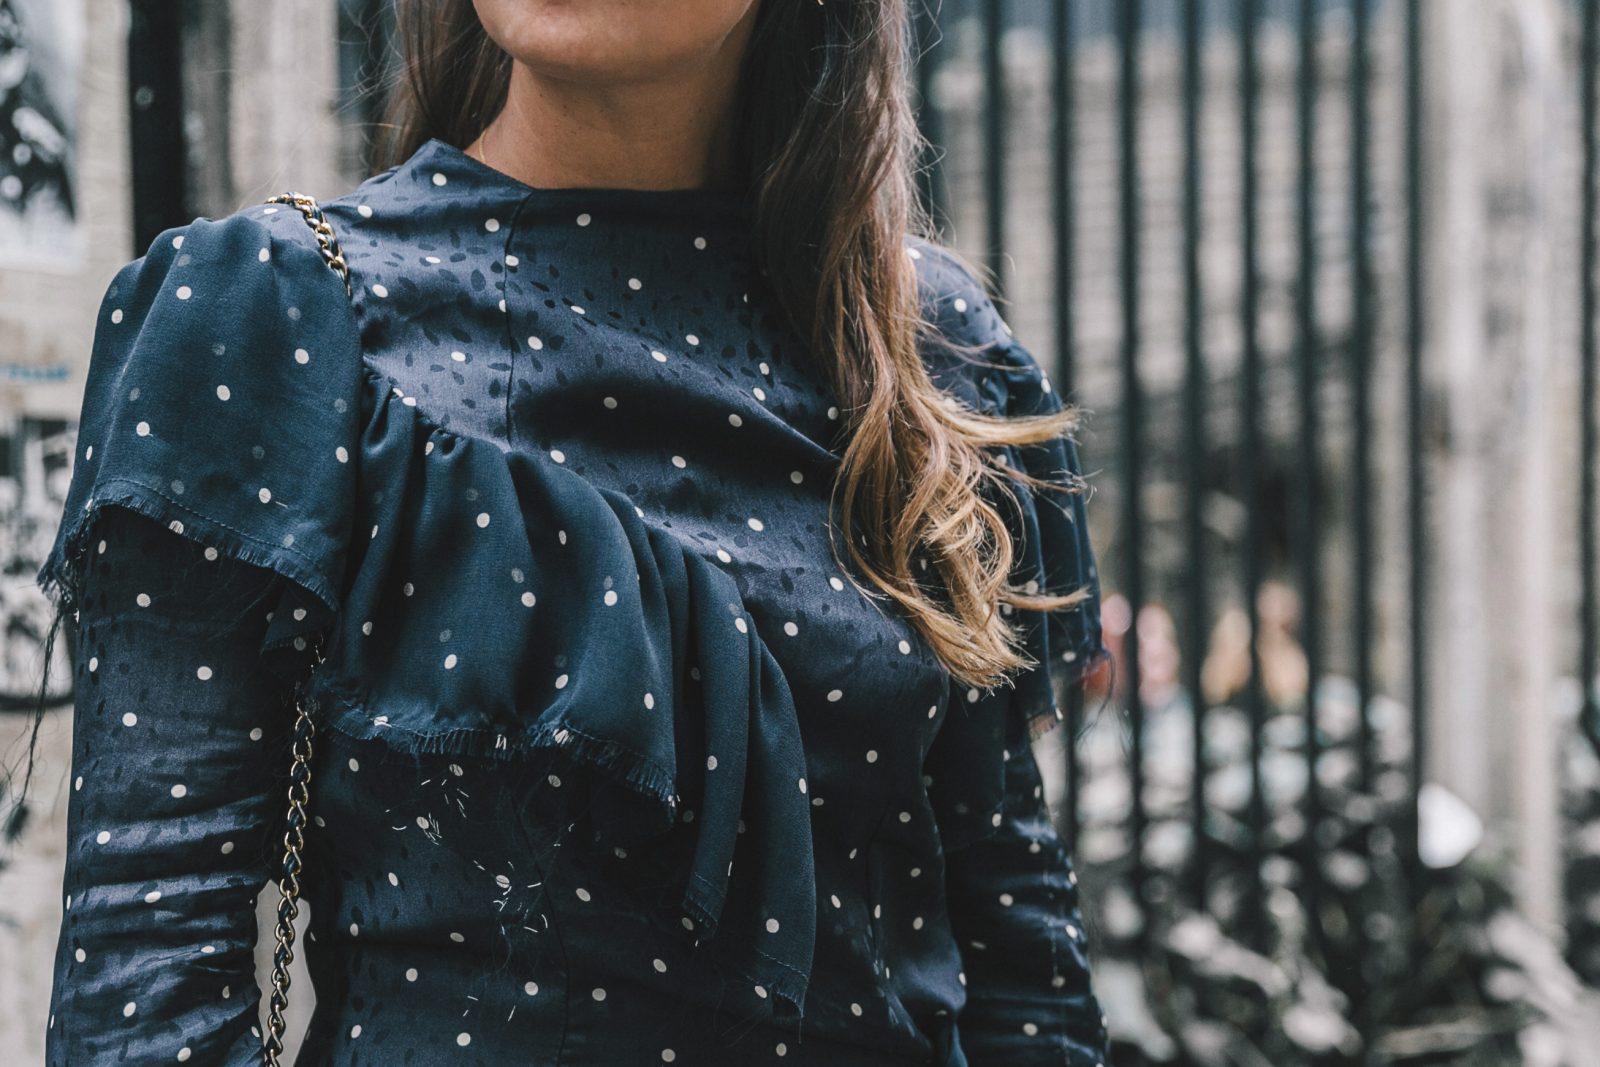 lfw-london_fashion_week_ss17-street_style-outfits-collage_vintage-vintage-topshop_unique-polka_dot_dress-white_mules-topshop_boutique-adenorah-33